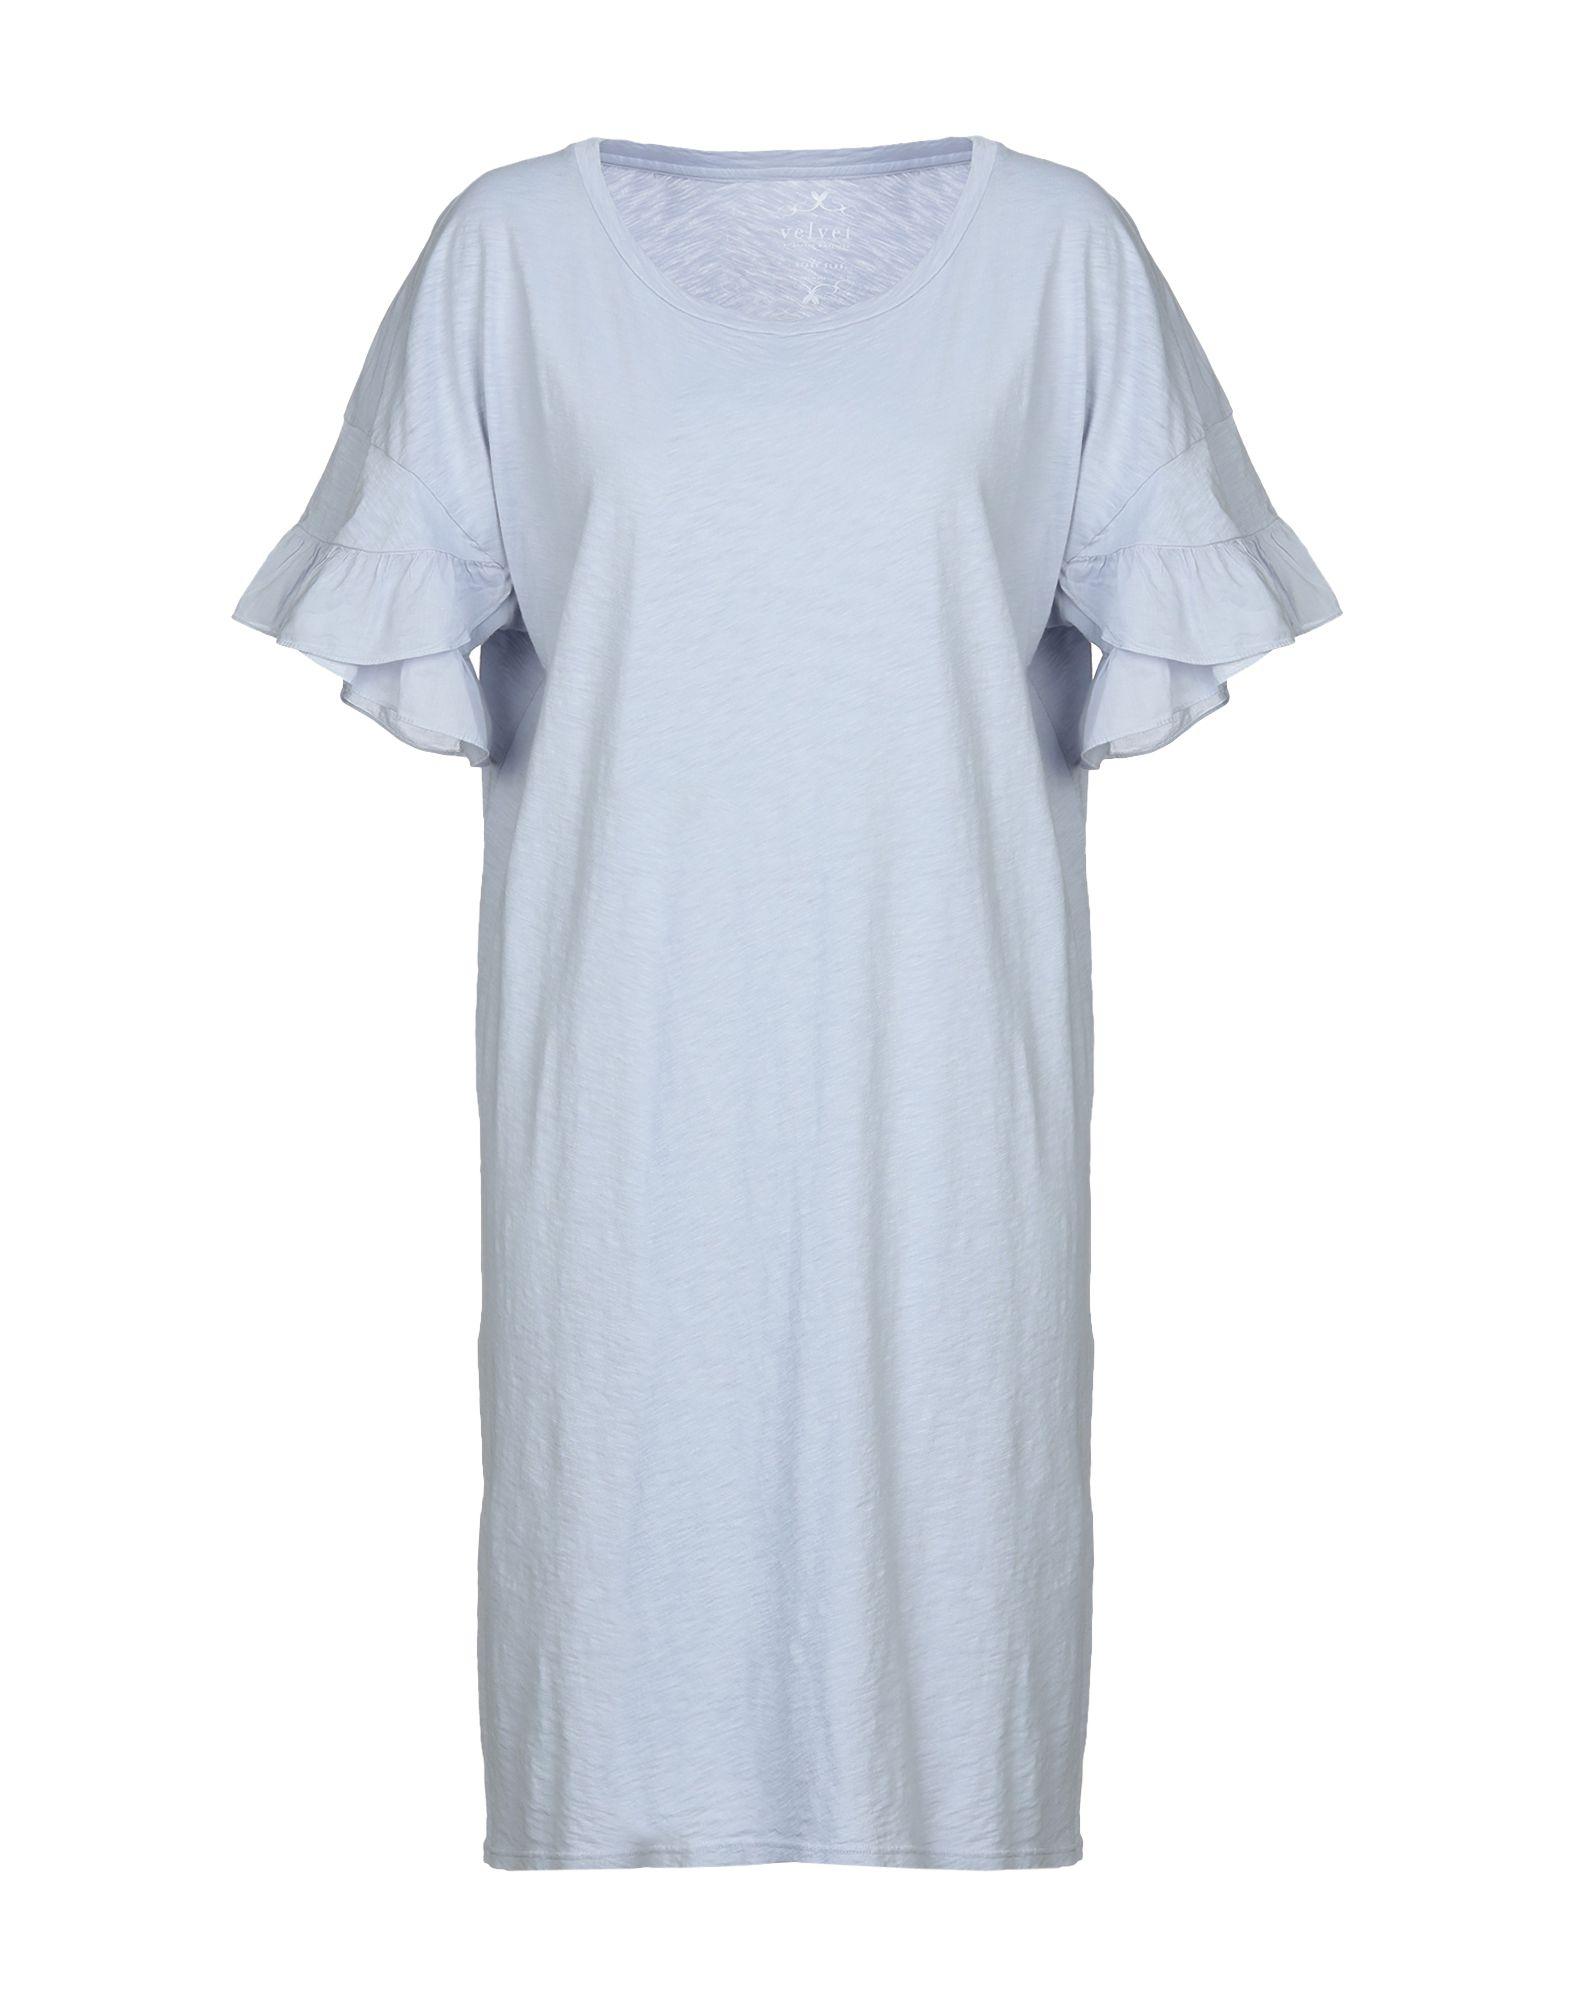 VELVET by GRAHAM & SPENCER Короткое платье 12storeez полуботинки из замши серо бежевые